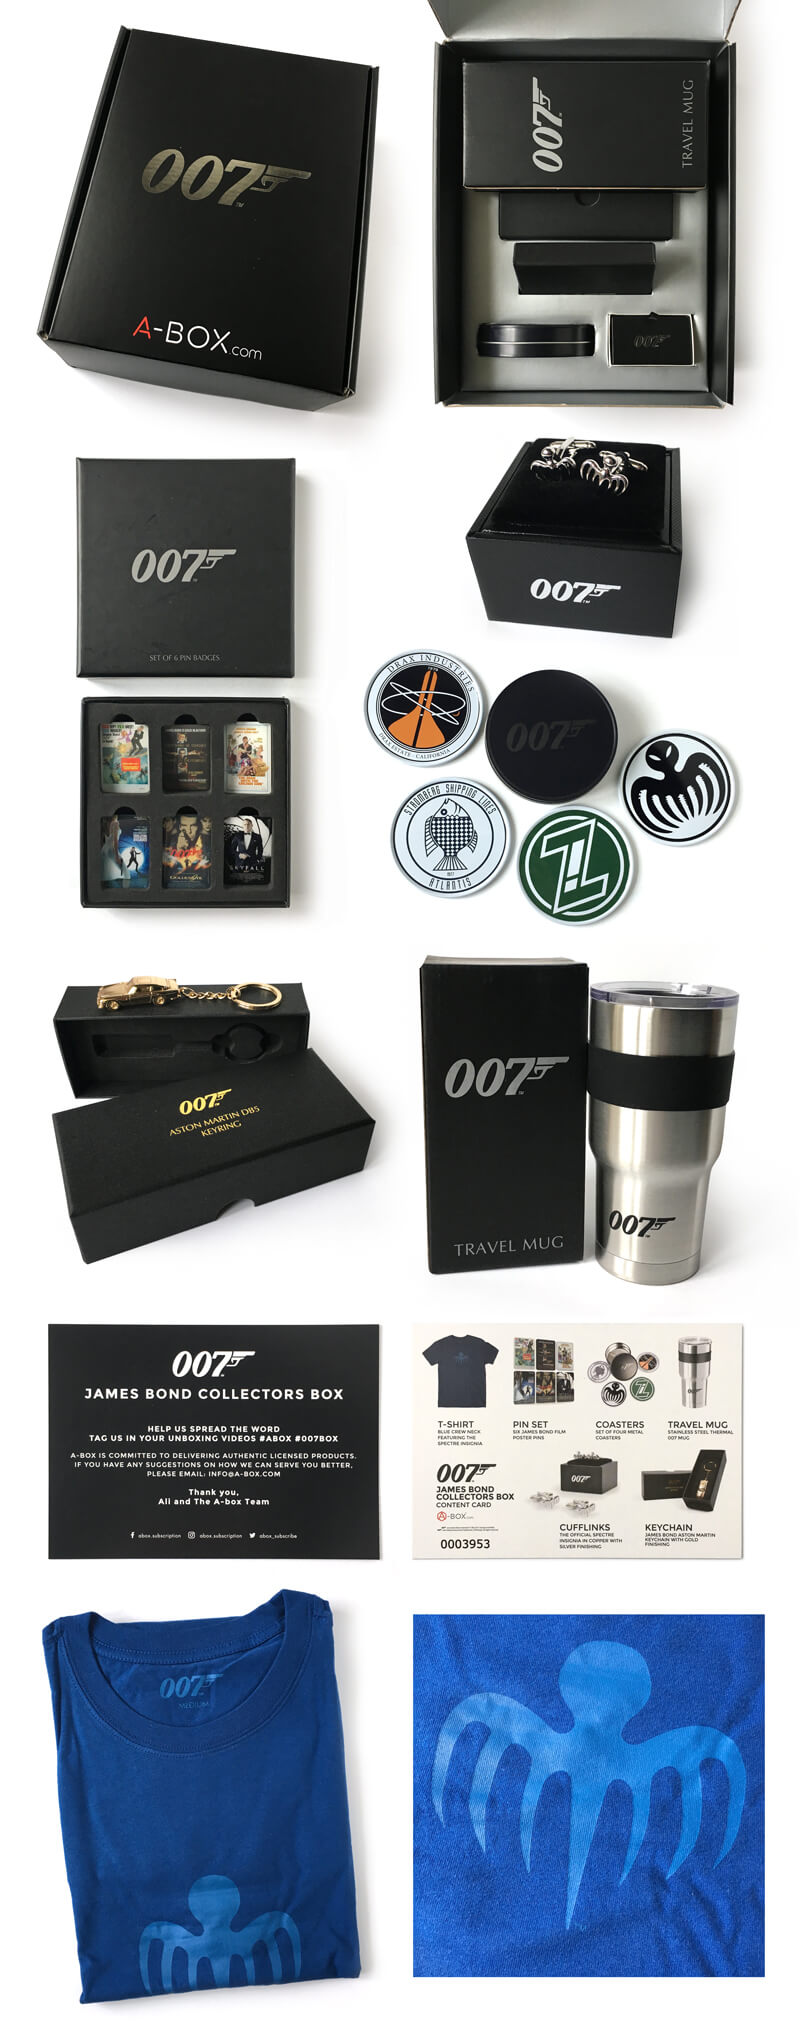 3f38e4ee2a4 James Bond 007 Collectors Box containing Spectre t-shirt